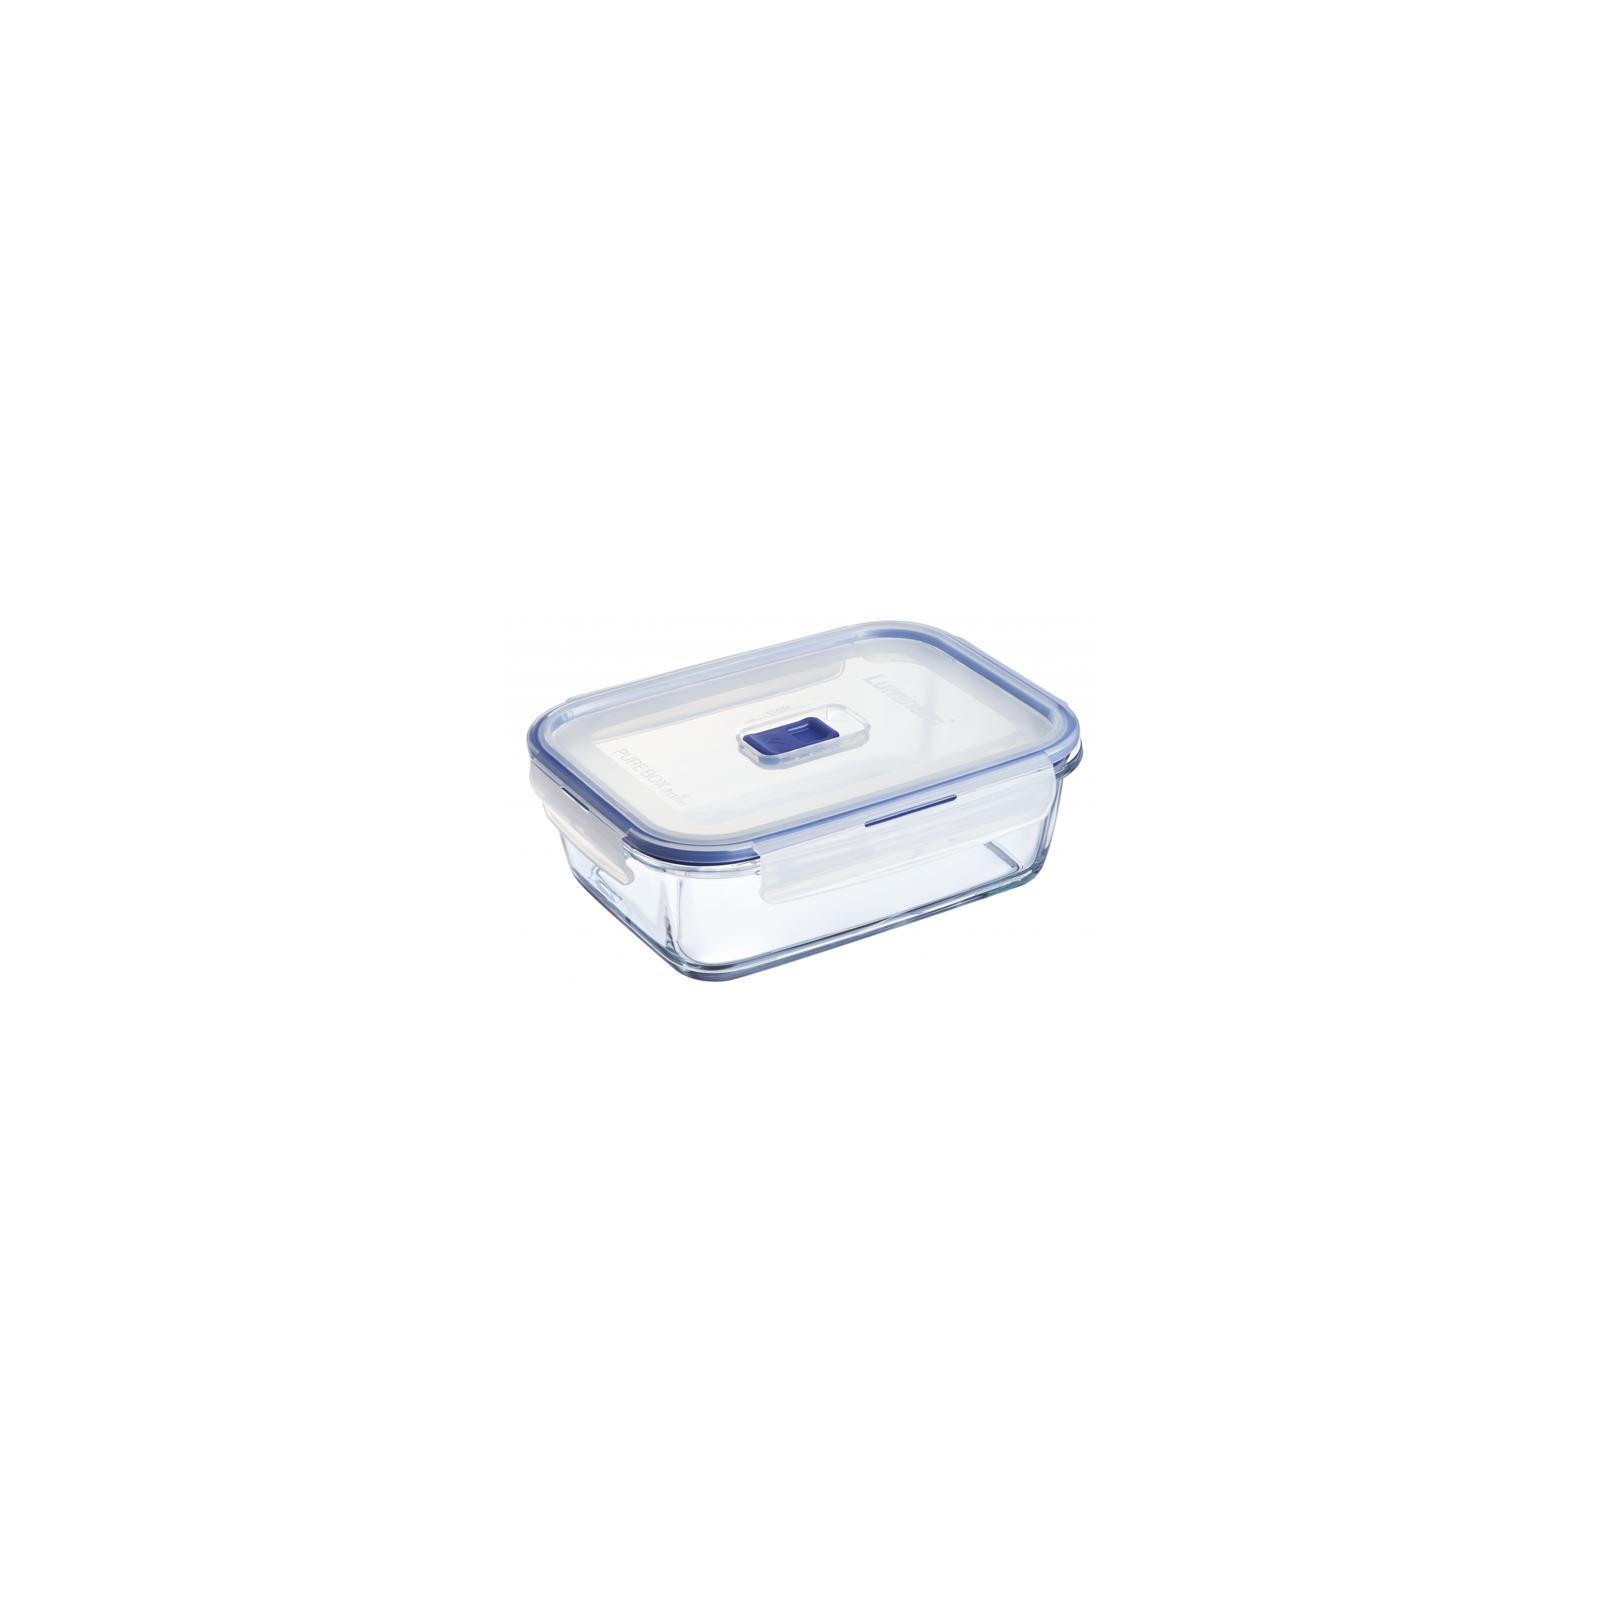 Пищевой контейнер Luminarc Pure Box Active прямоуг. 1220 мл (P3548)